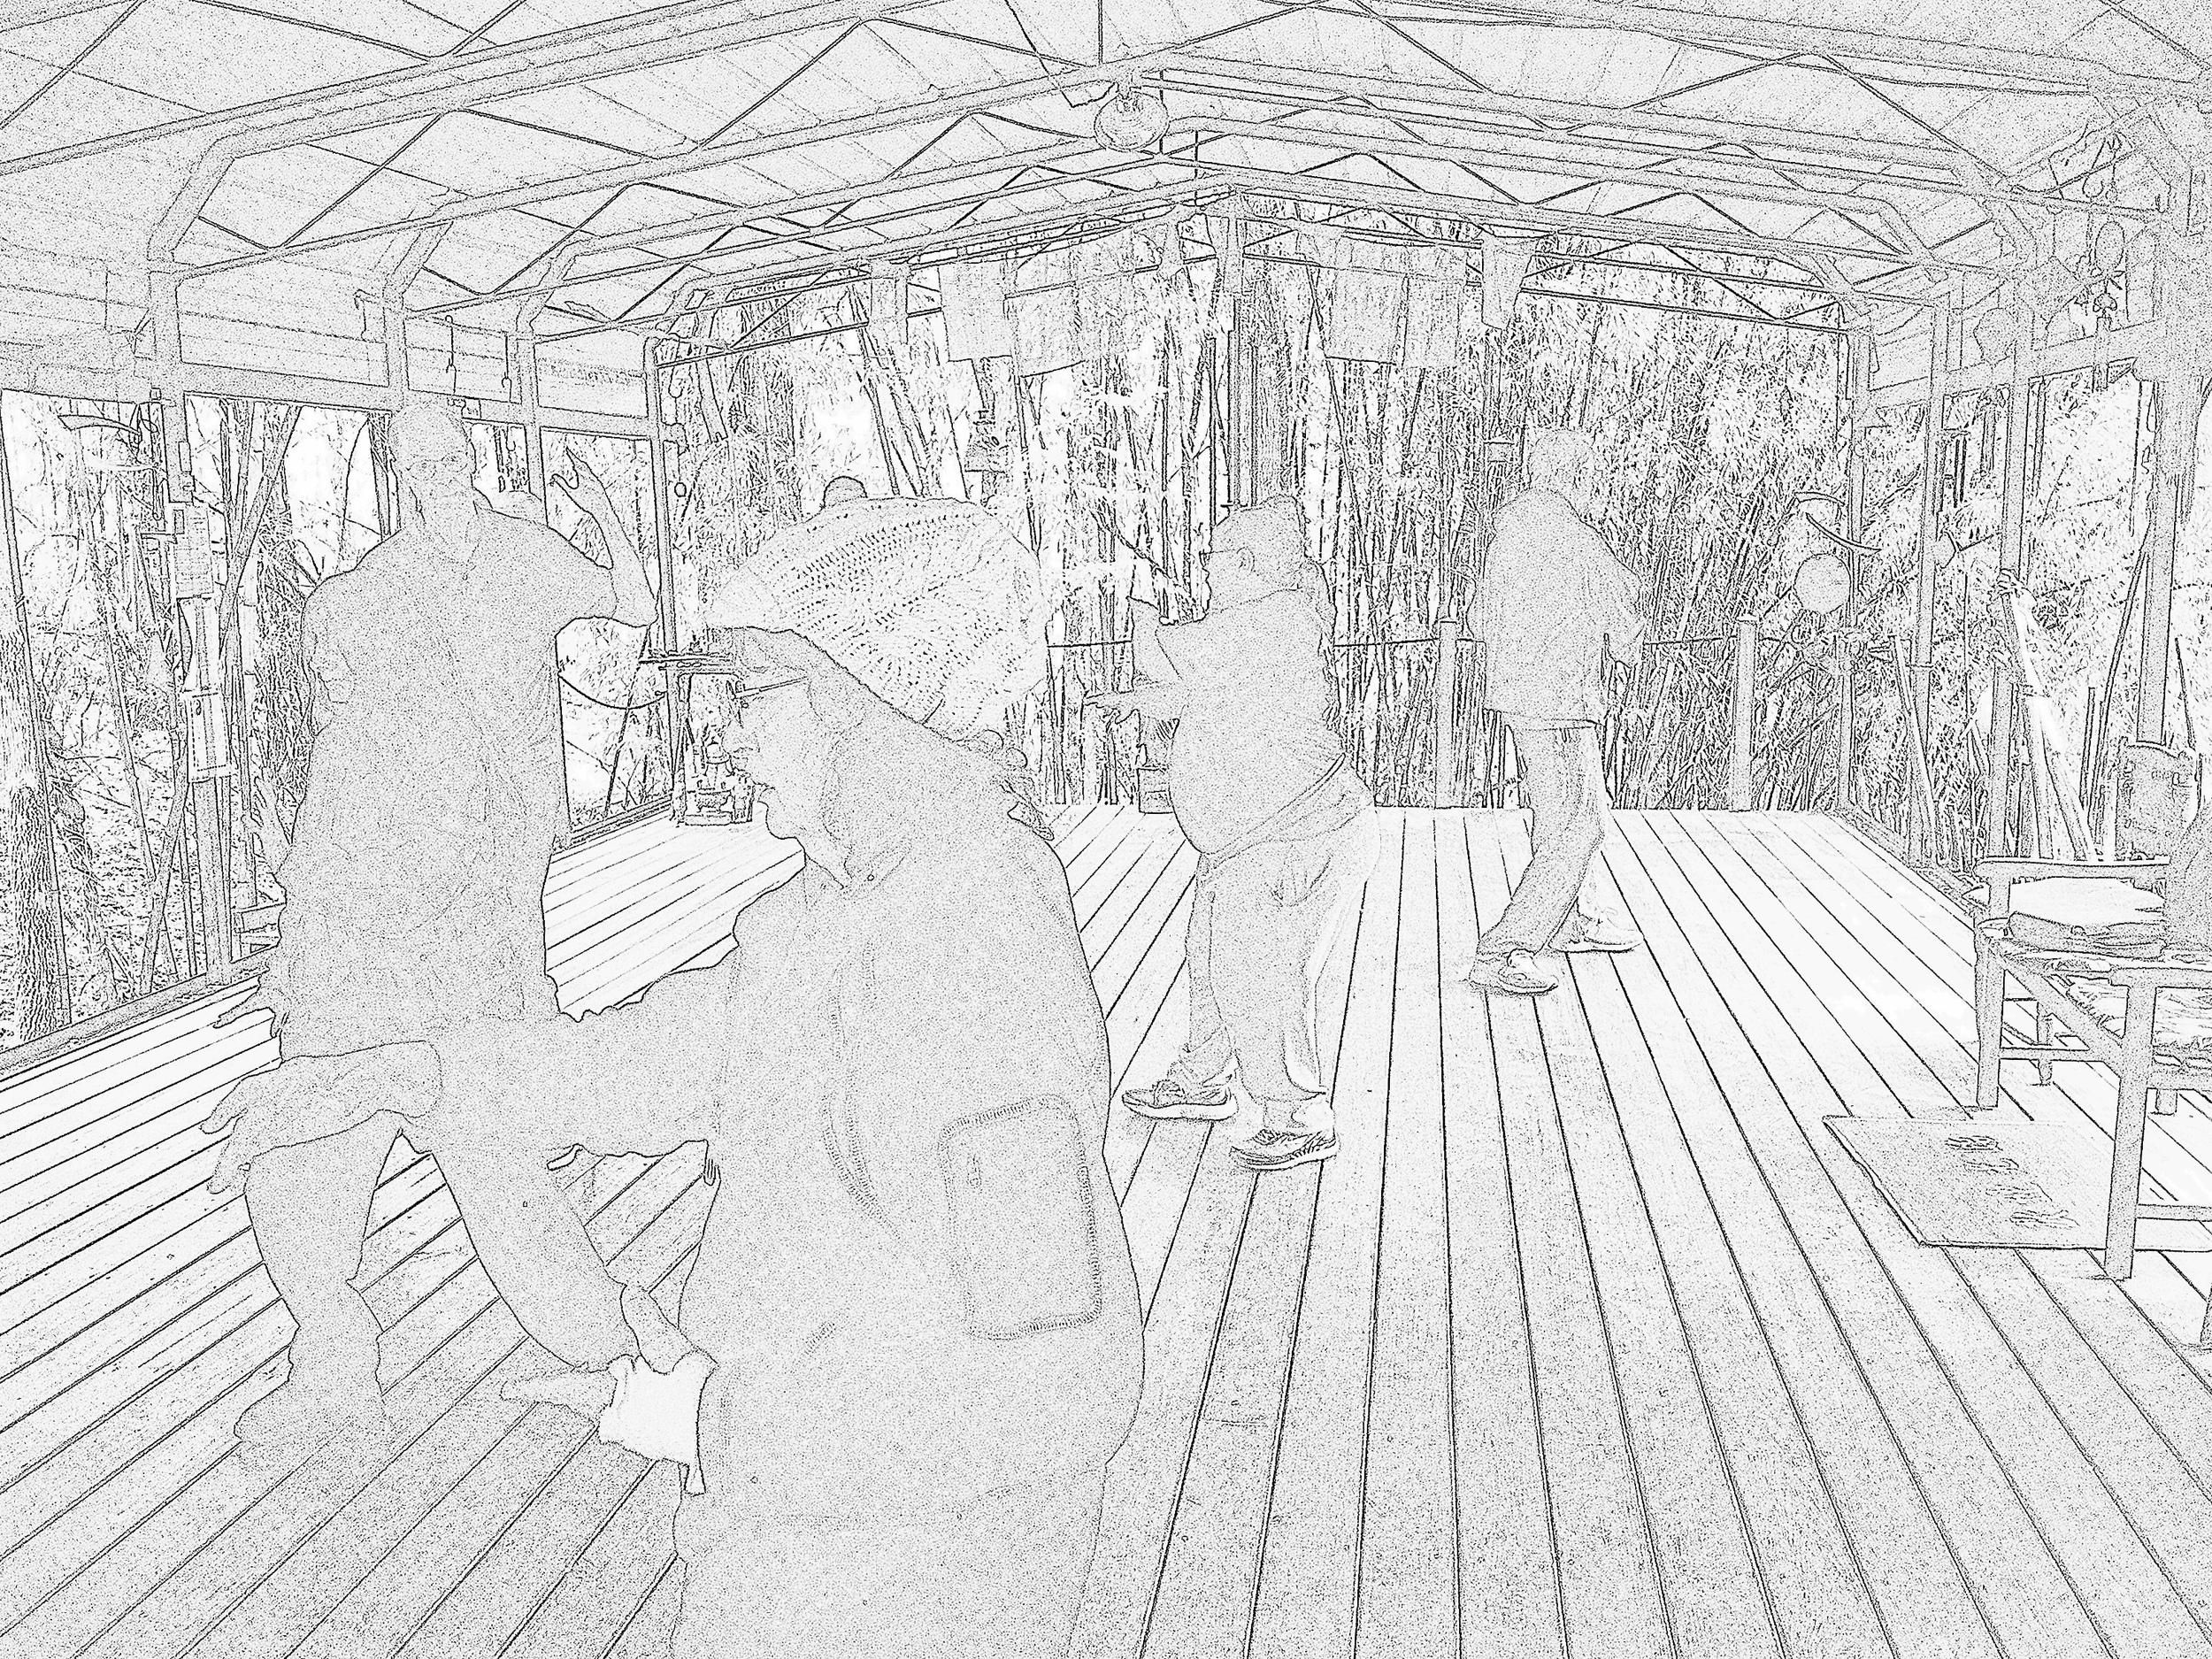 Taiji on the pavilion